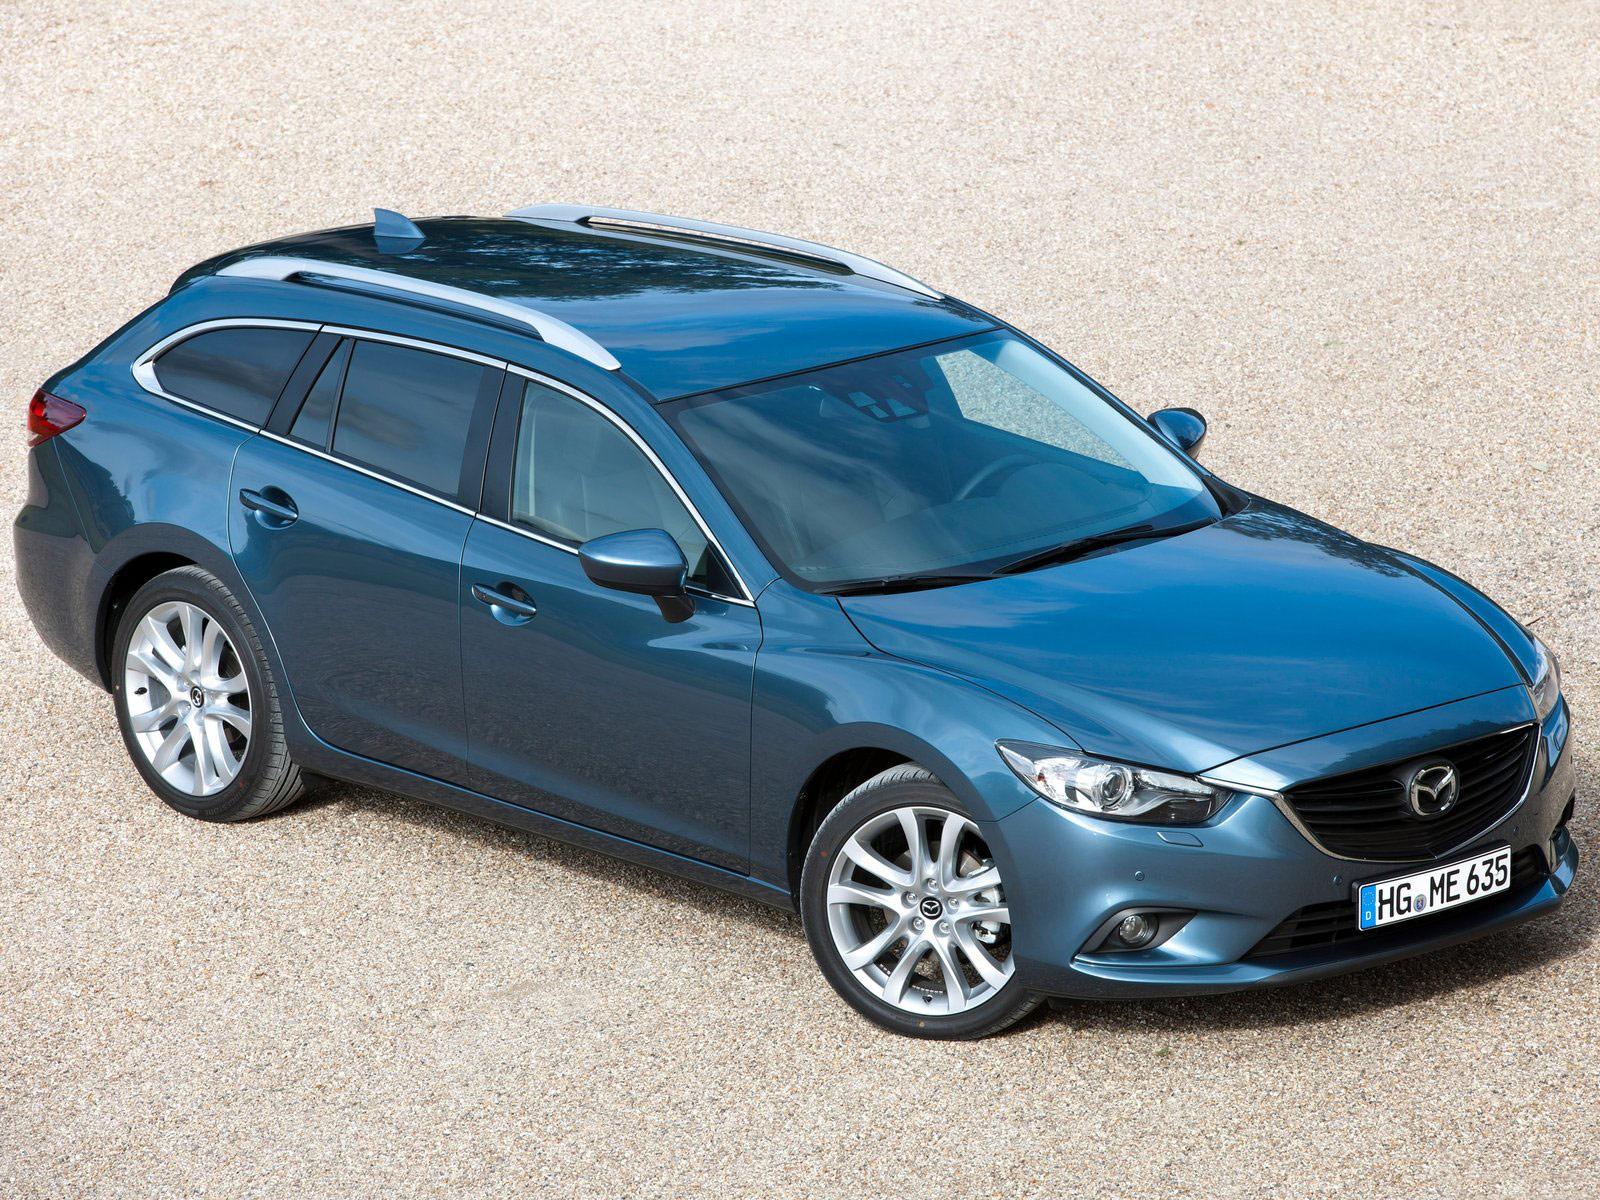 2005 Mazda 6 Wagon Facelift – XXI Century Cars